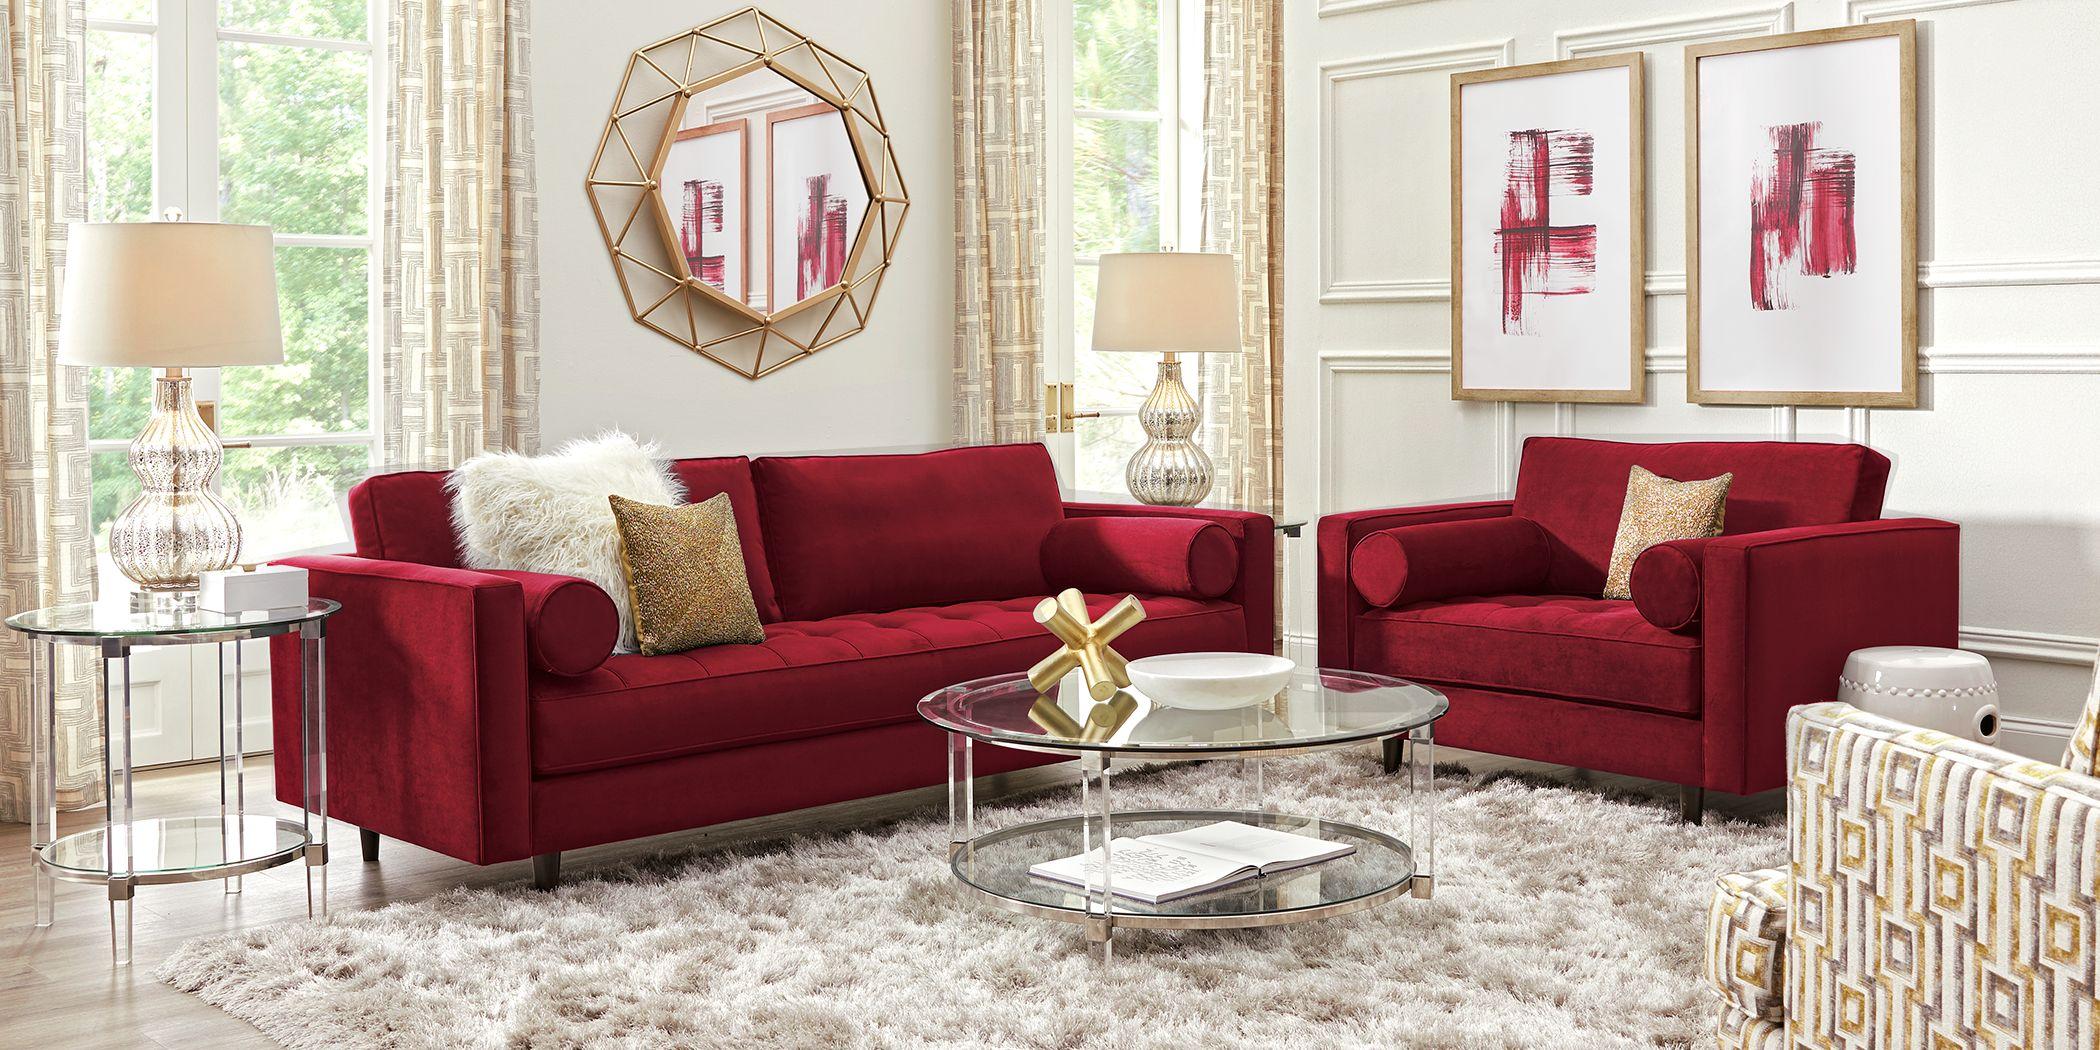 Sofia Vergara Pacific Palisades Scarlet Plush 5 Pc Living Room